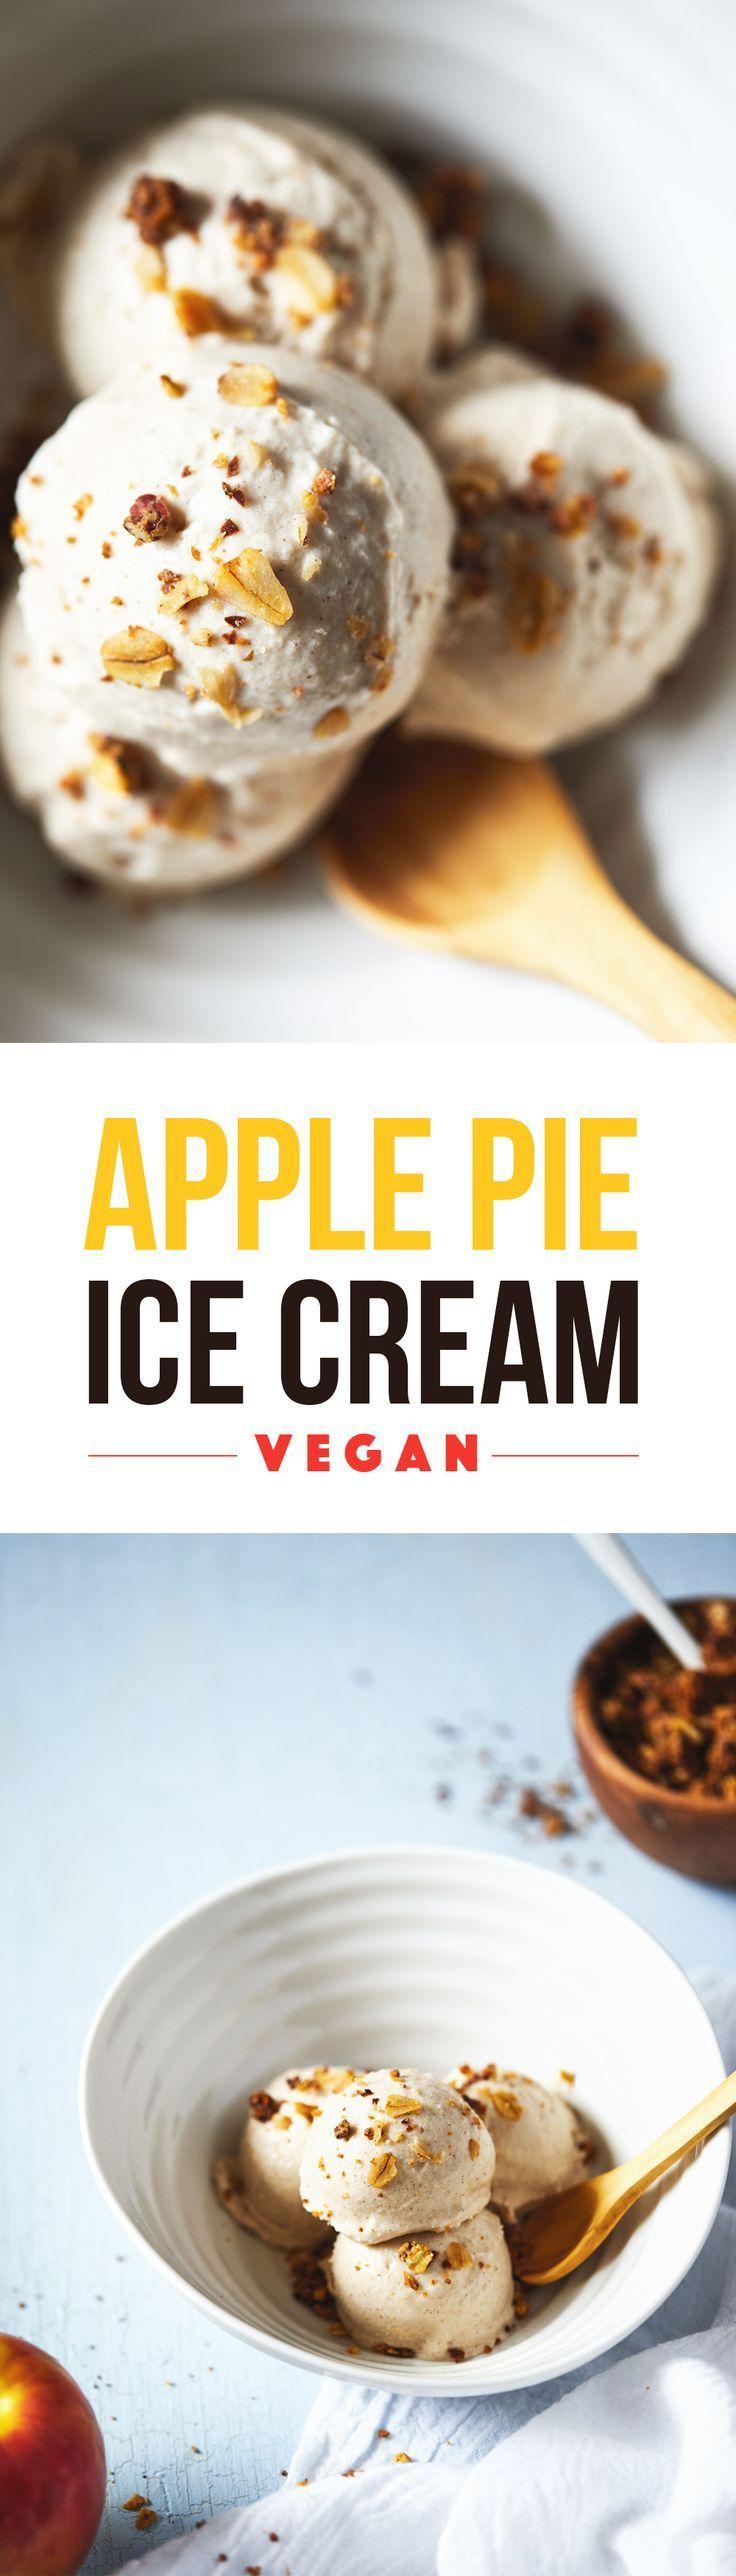 Ice cream and healthy versions of ice cream on Pinterest | Vanilla Ice ...